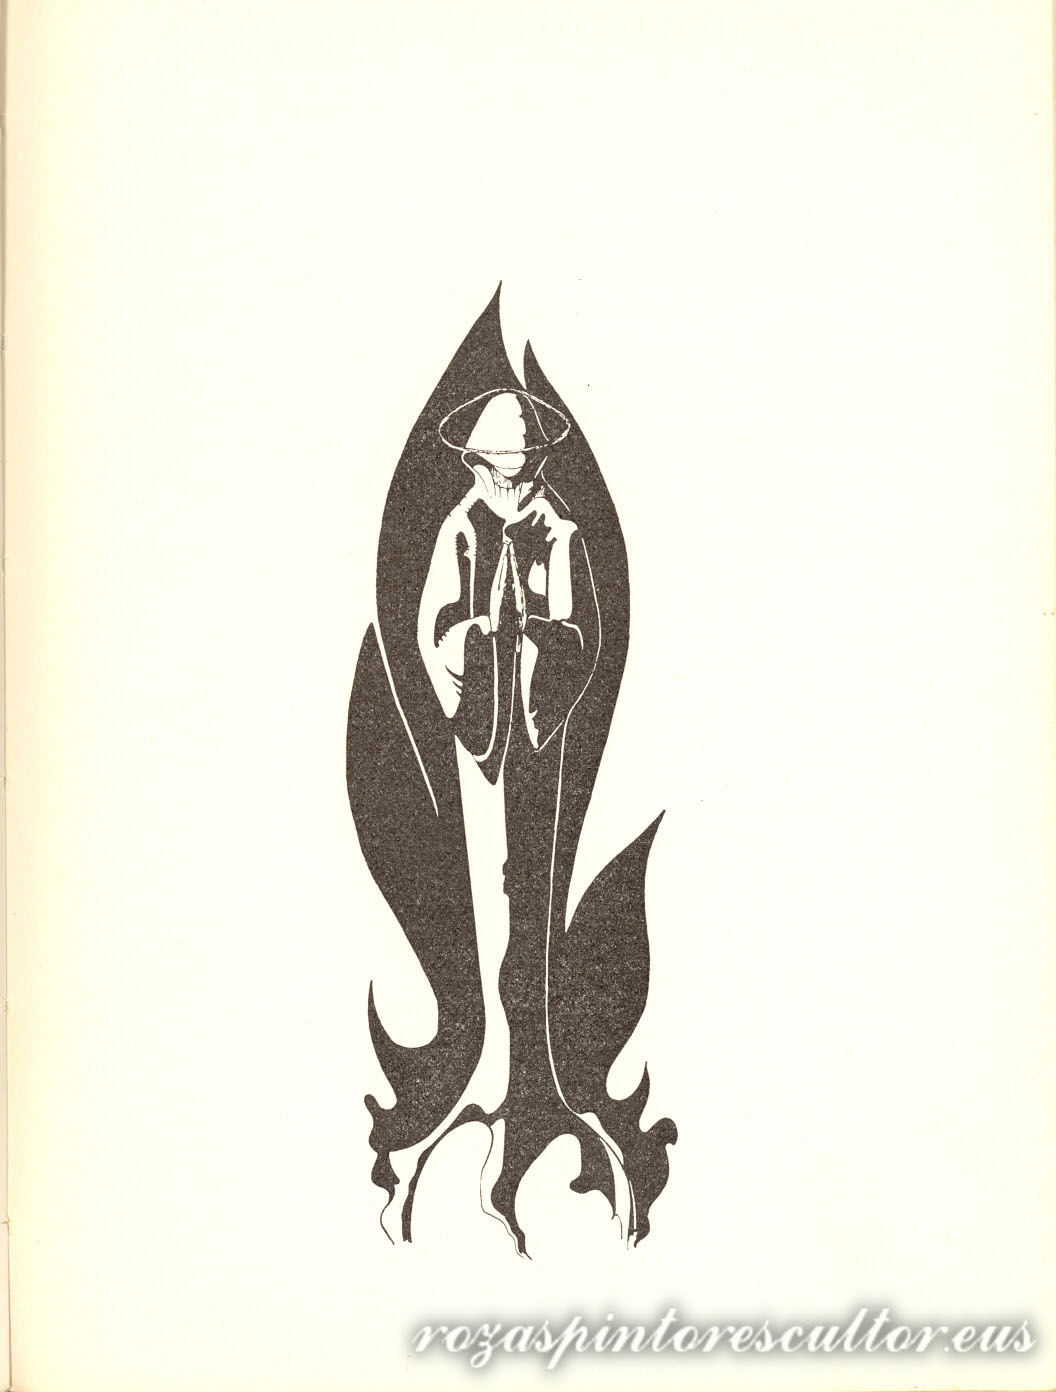 1966 Marian Misterioak 9